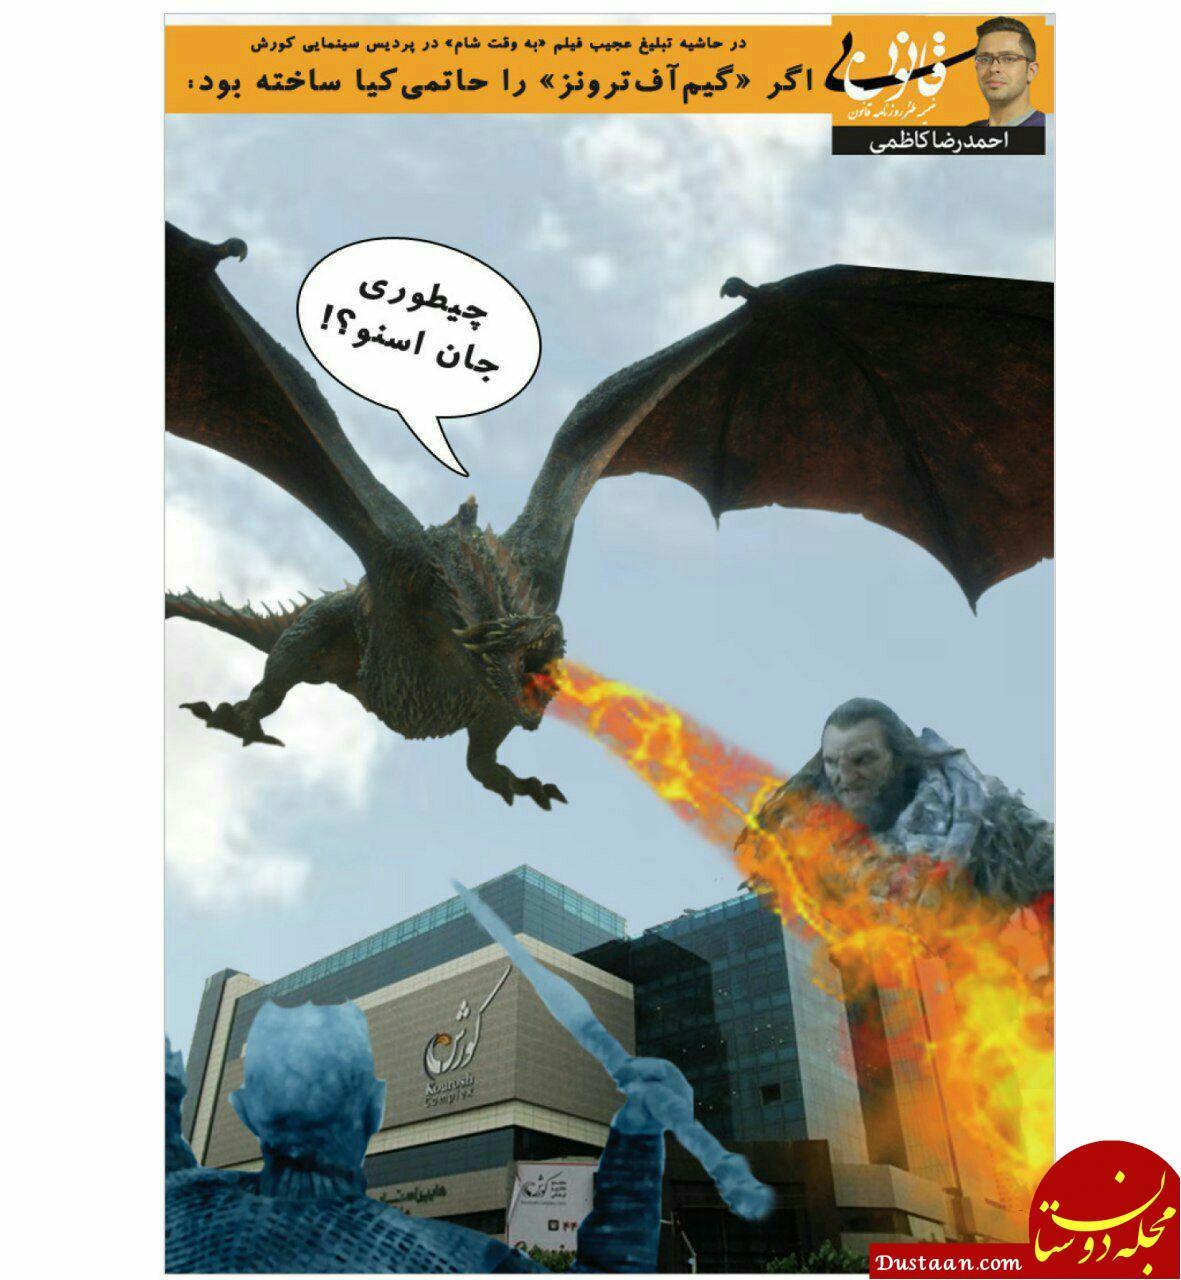 www.dustaan.com اگر گیم آو ترونز را حاتمی کیا ساخته بود! +عکس